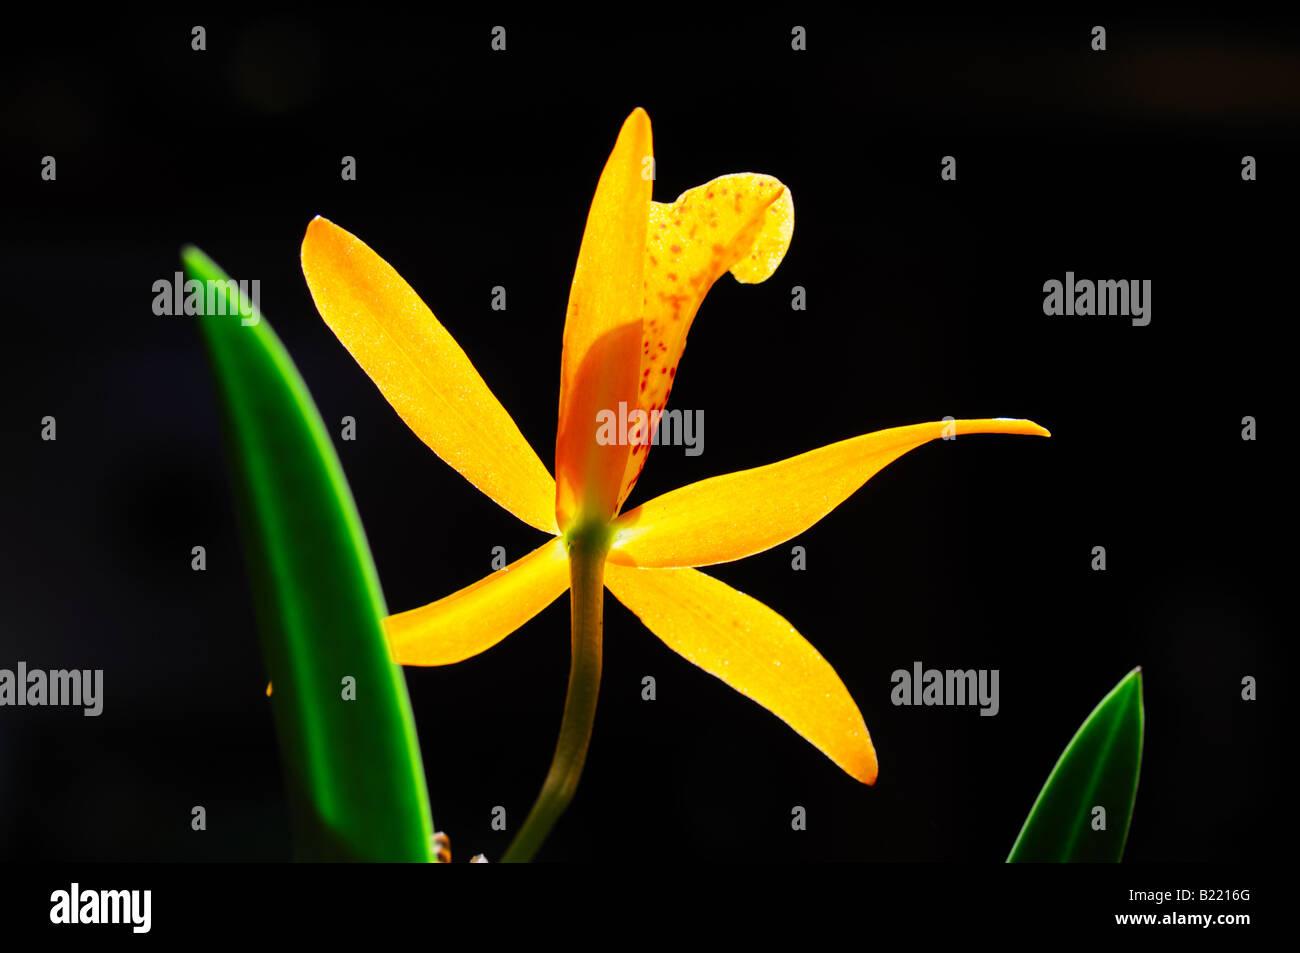 Orchid flower, Brassolaeliocattleya Blc. Haleahi Sunbow x Blc. Richard Mueller. - Stock Image